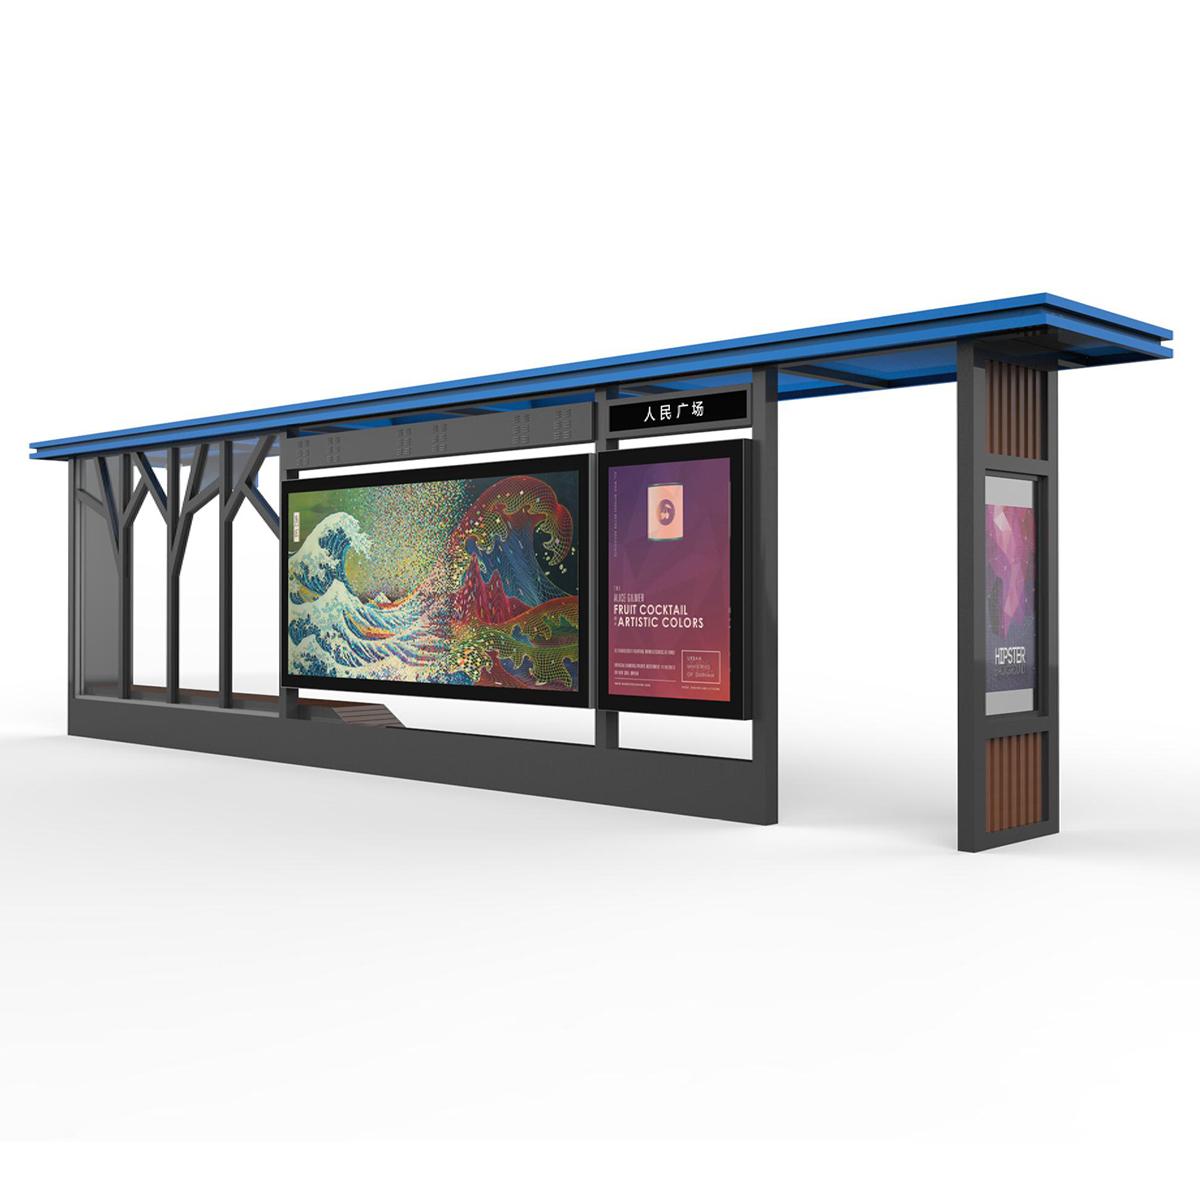 YEROO-bus shelter ad | Smart bus shelter | YEROO-1